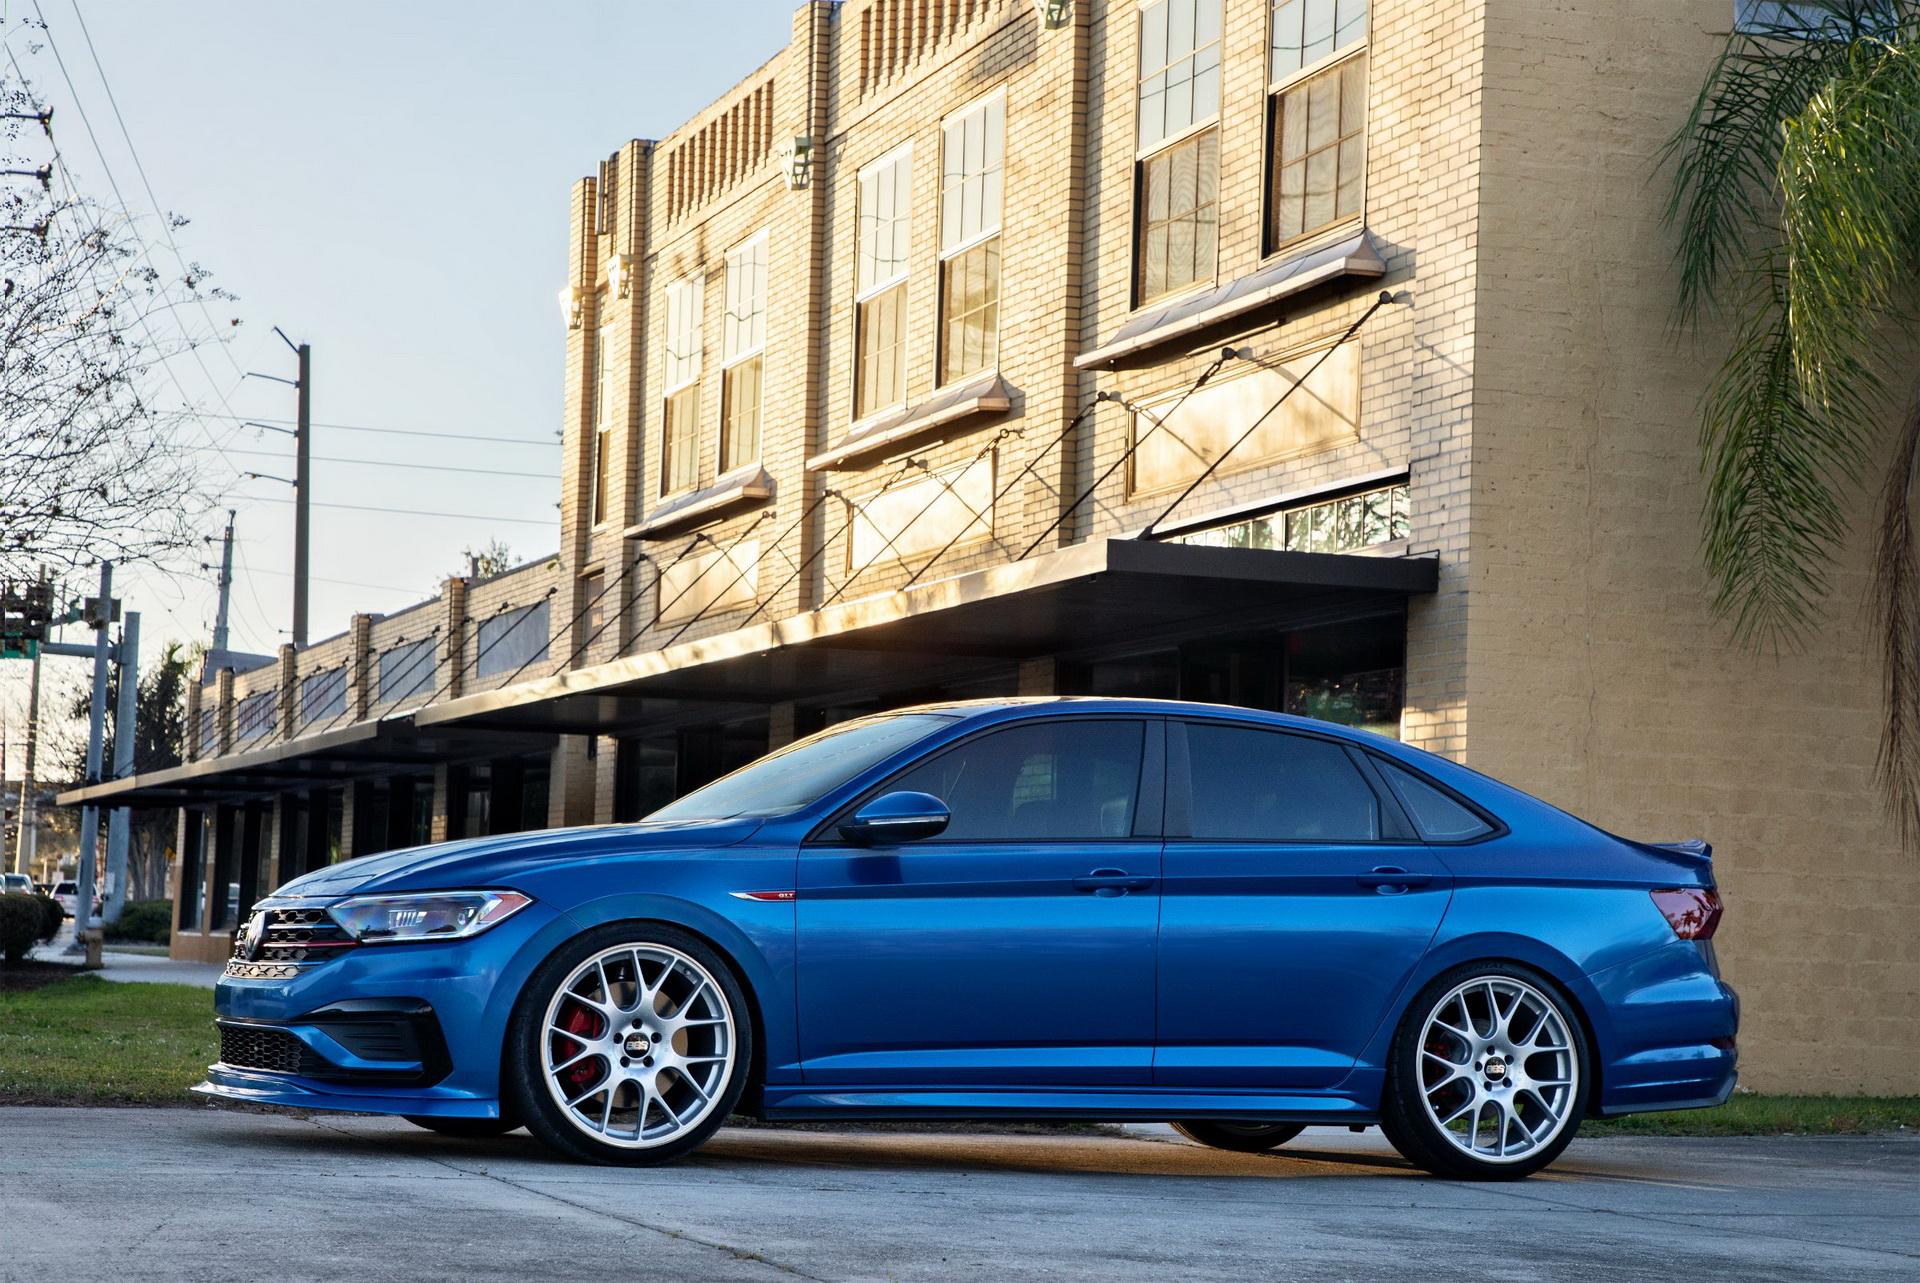 Volkswagen готовит спецсерию популярных моделей – Jetta уже готова 2